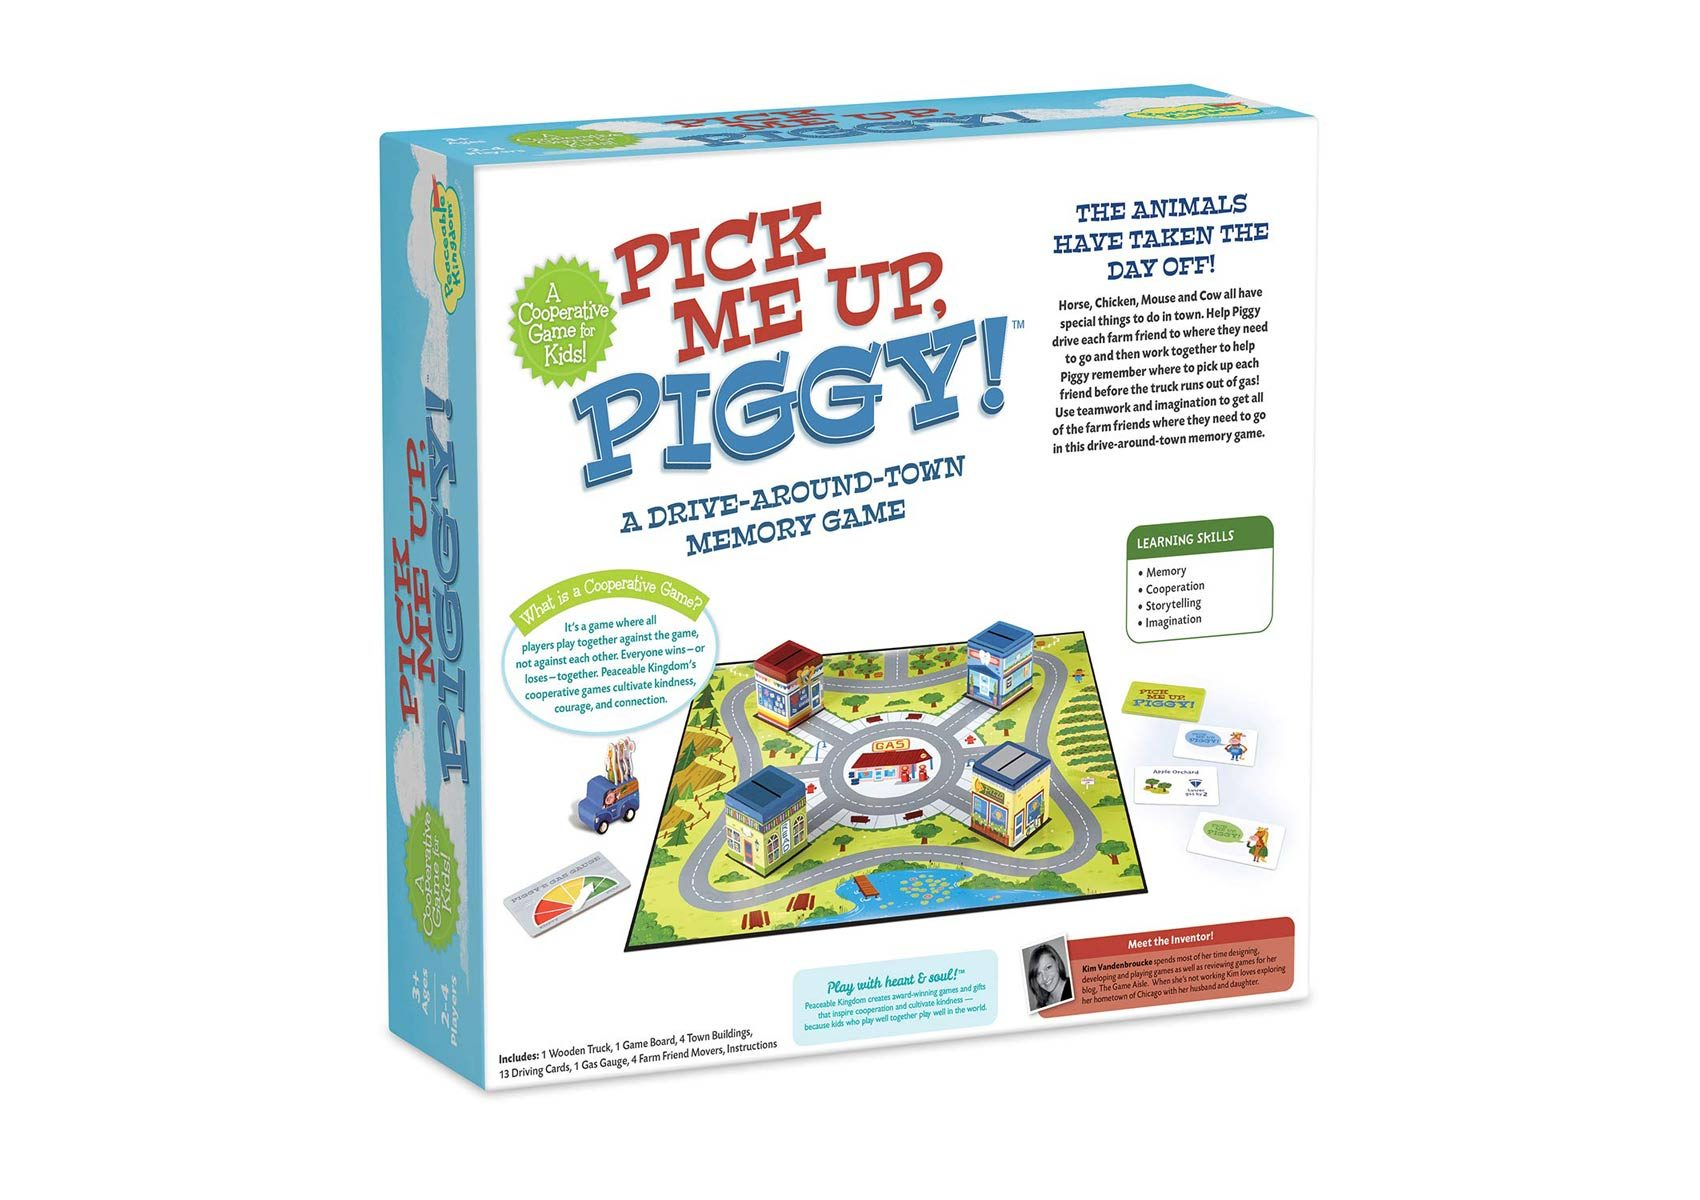 Pick Me Up Piggy! Bacjk of box